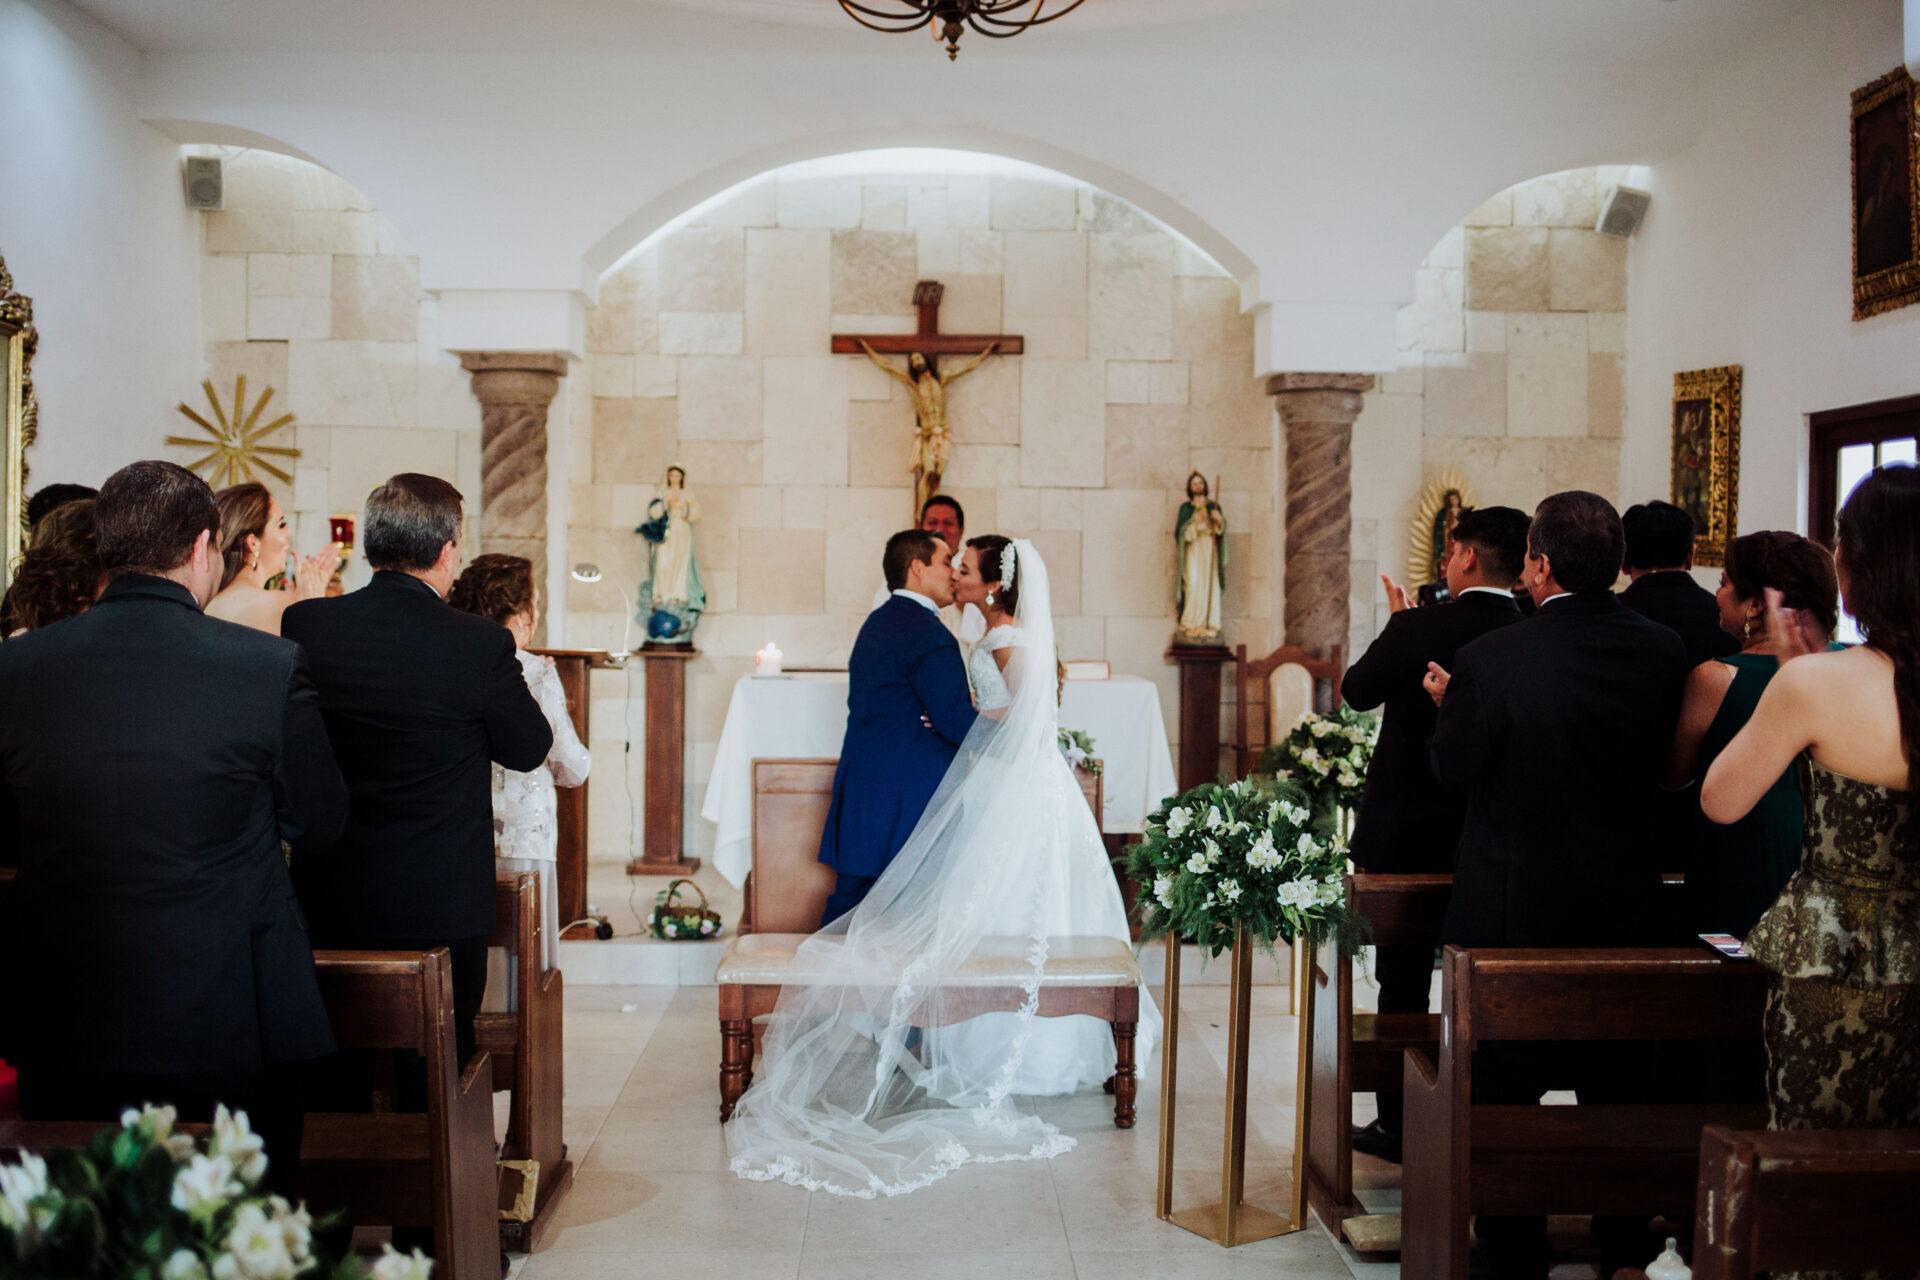 javier_noriega_fotografo_bodas_torreon_coahuila_zacatecas_wedding_photographer33a